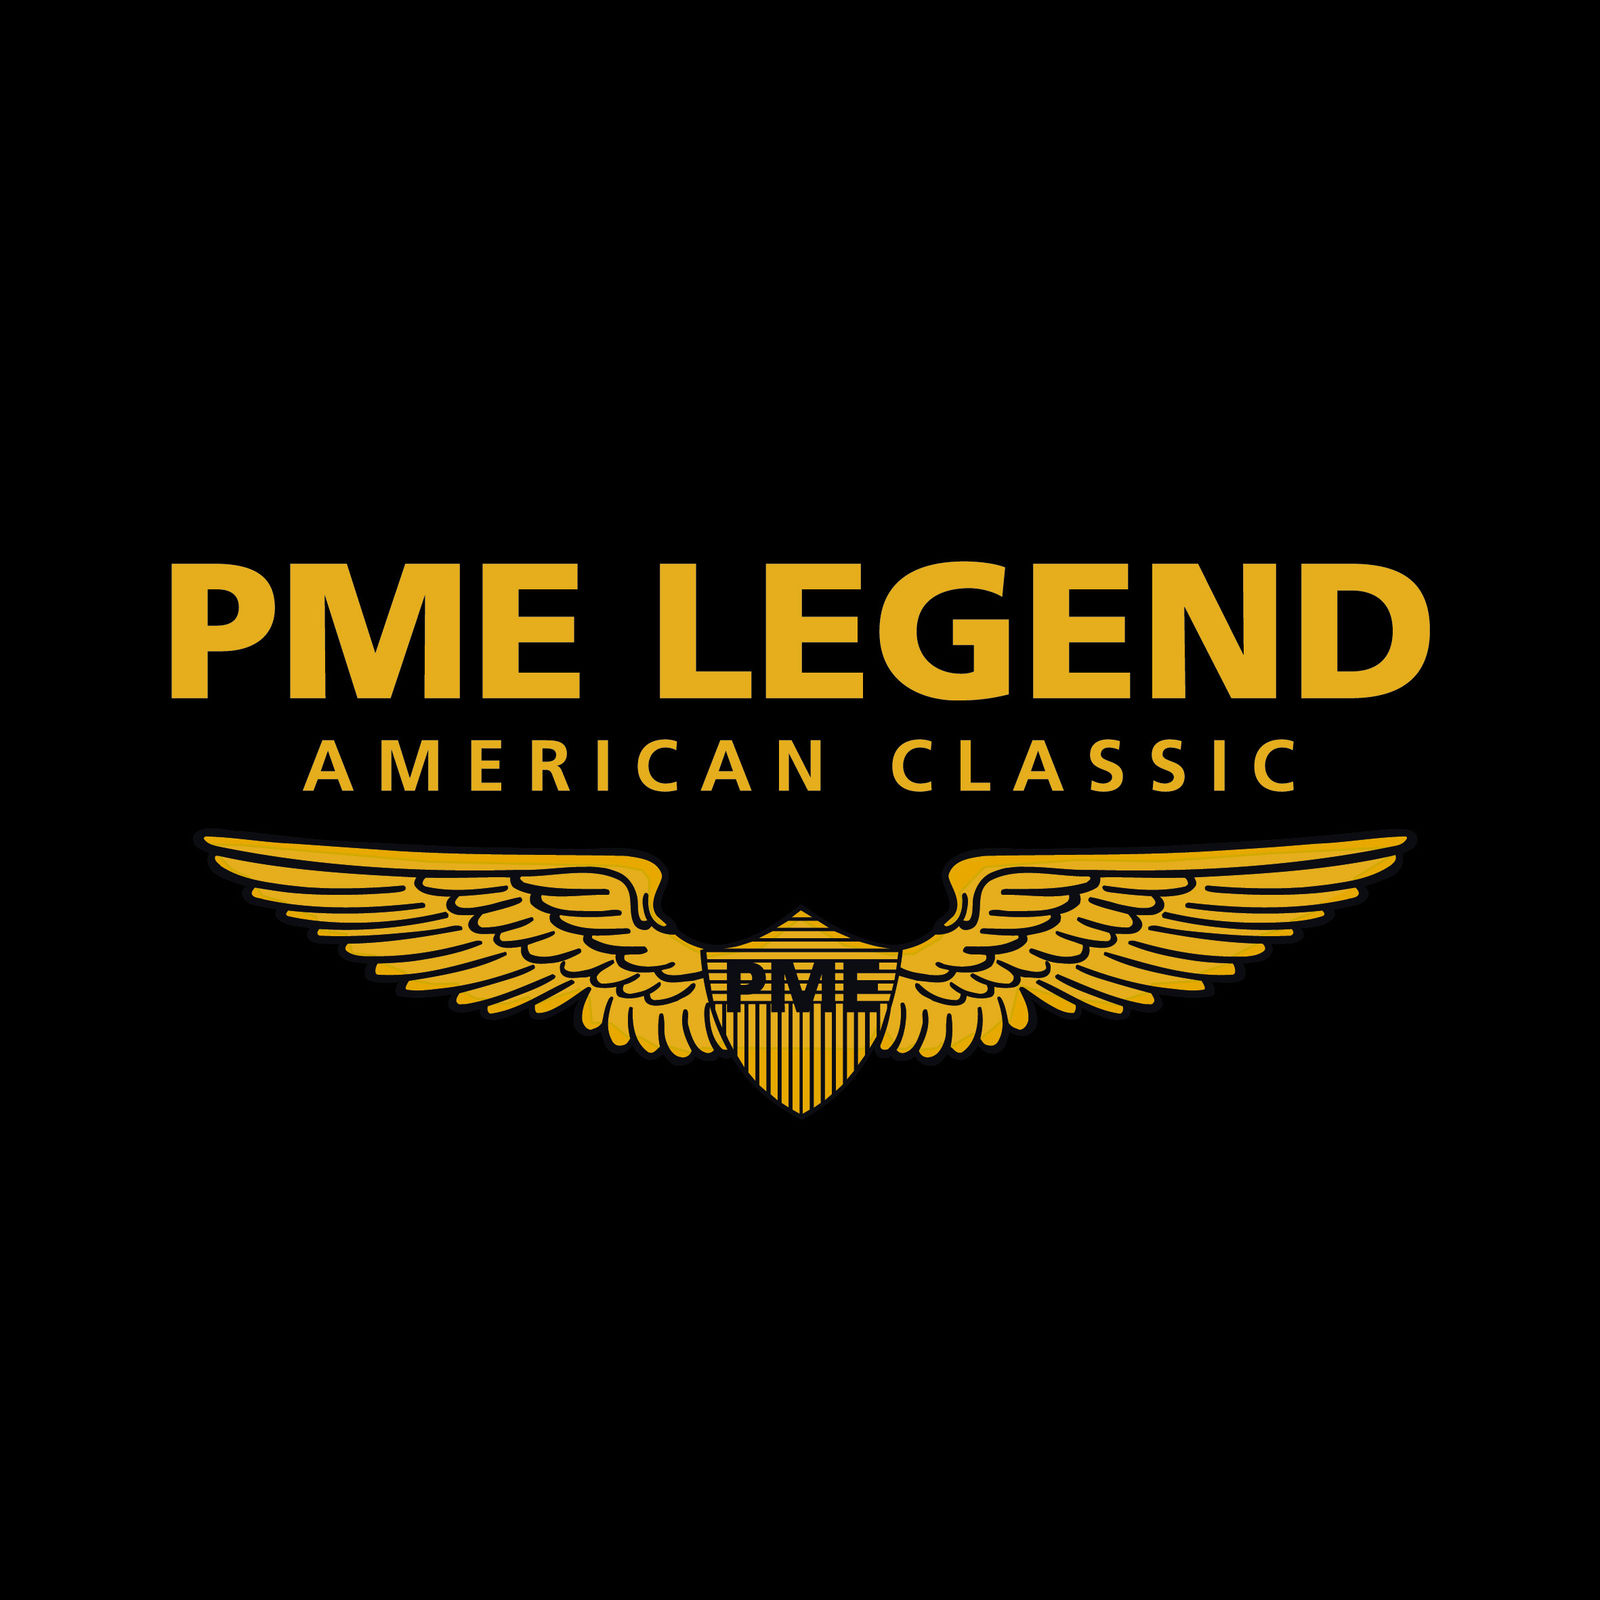 PME Legend (Afbeelding 1)